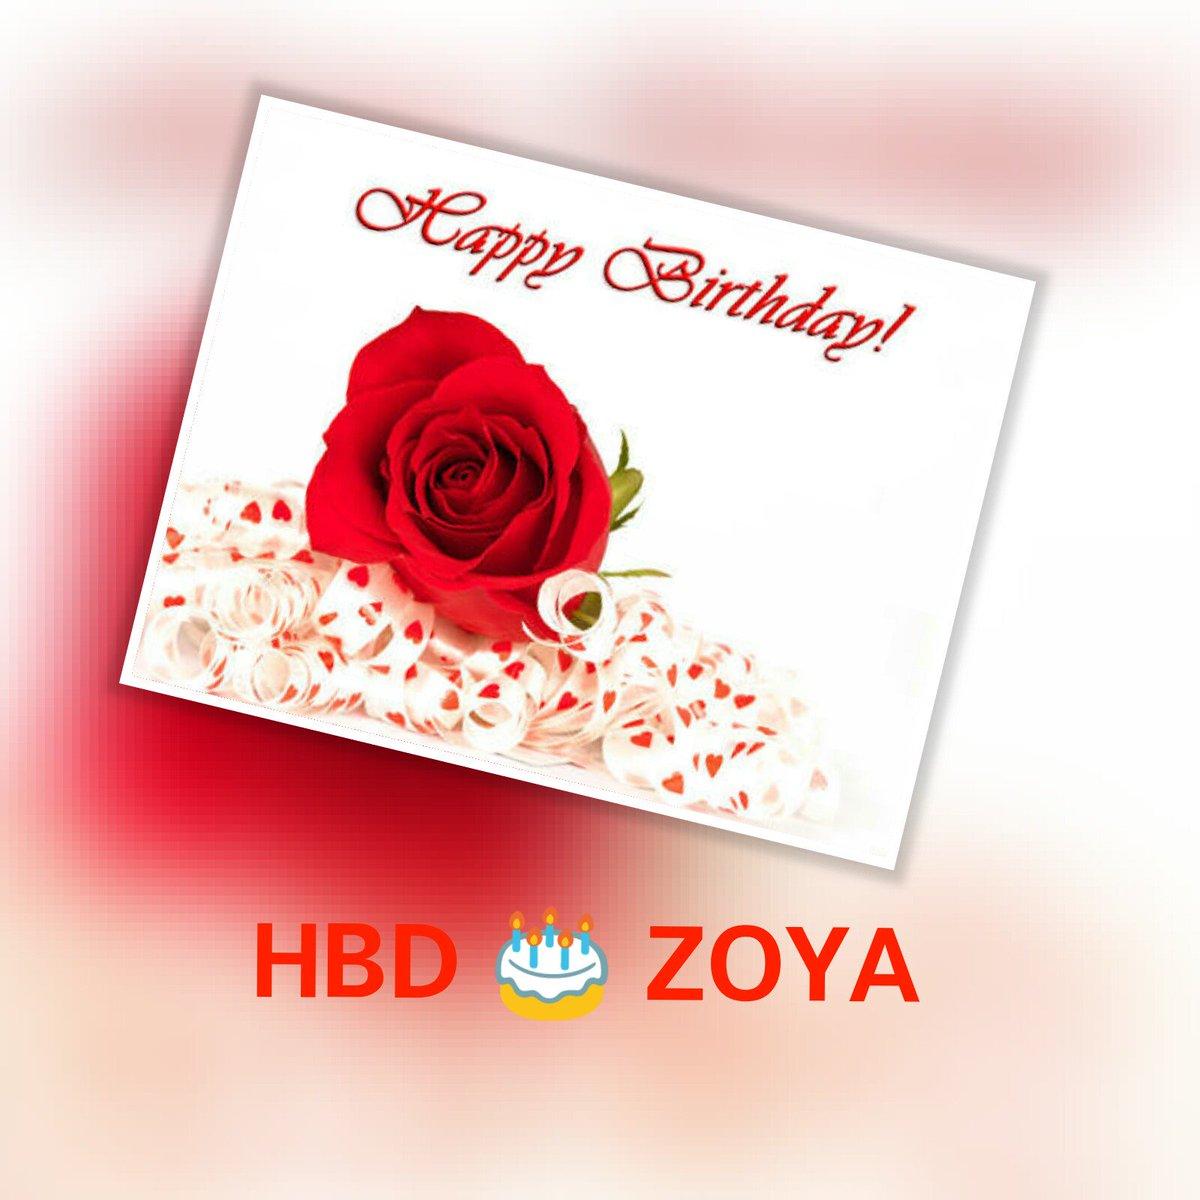 Happy Birthday Wishing You Health Strength Many More Fun